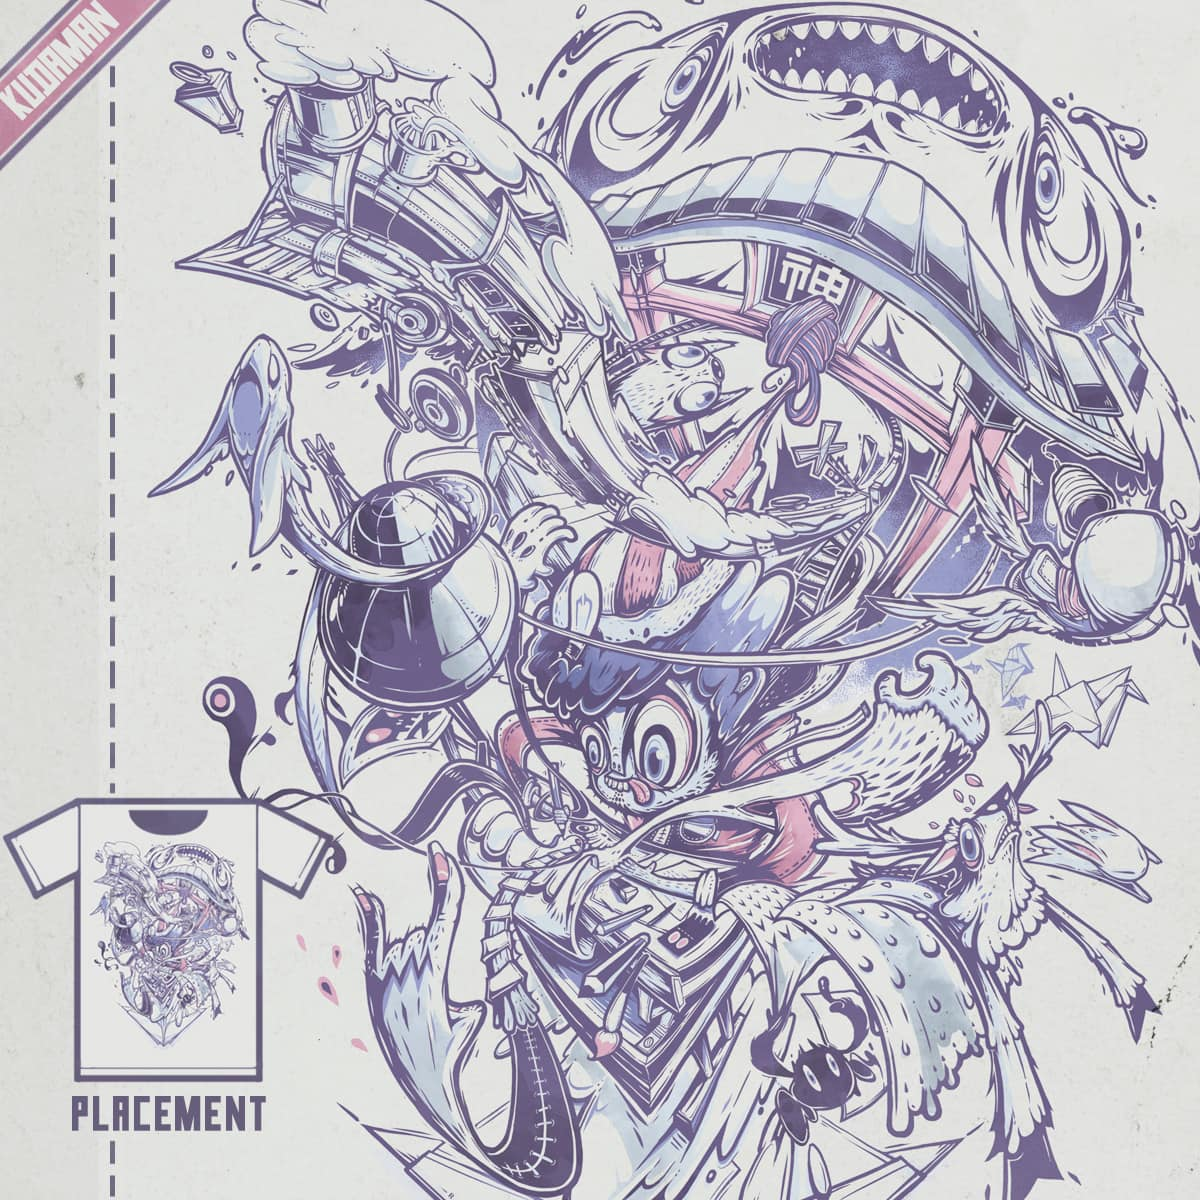 Imagination Comes to Life by Kudaman on Threadless